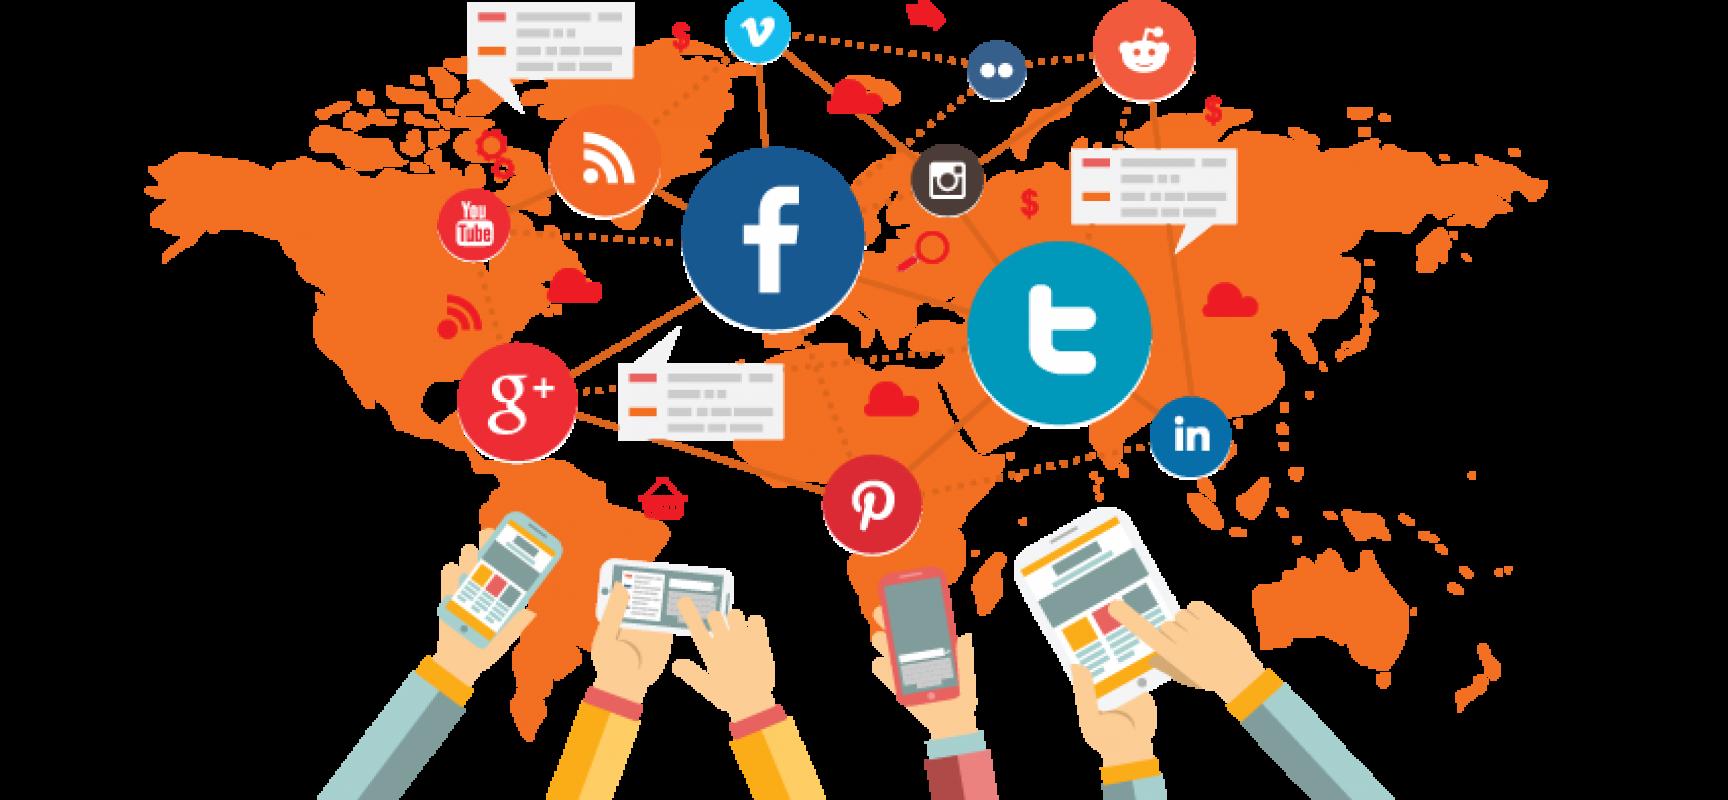 Social Media Marketing as an Integrated Approach